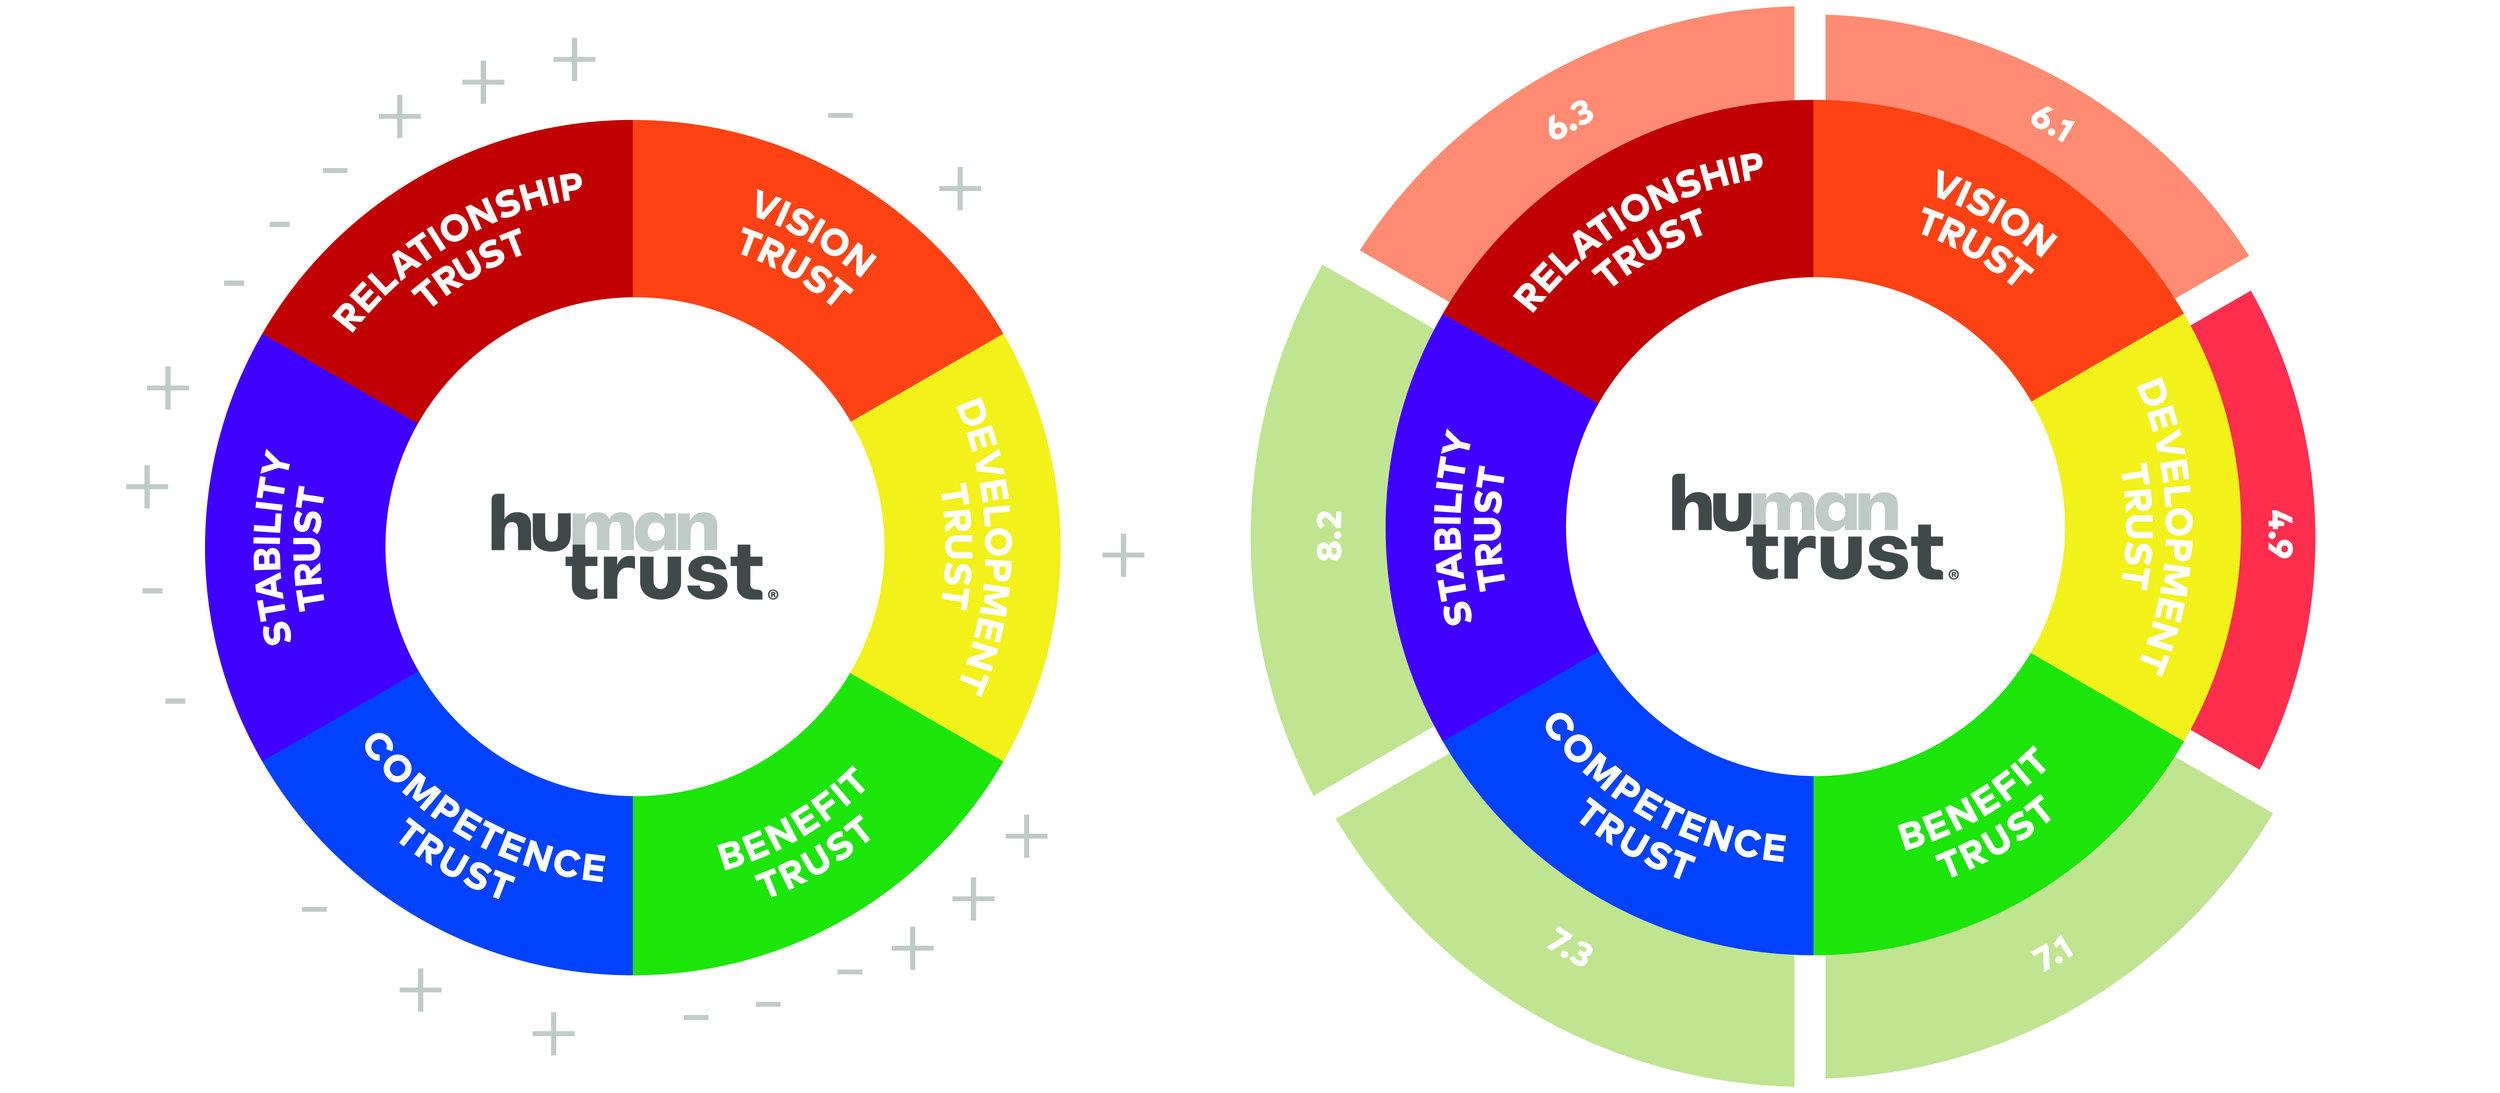 Mext_Consulting_Firm_Melbourne_Trust_HuTrust_Model_Human_Trust_Plus_Minus.jpg